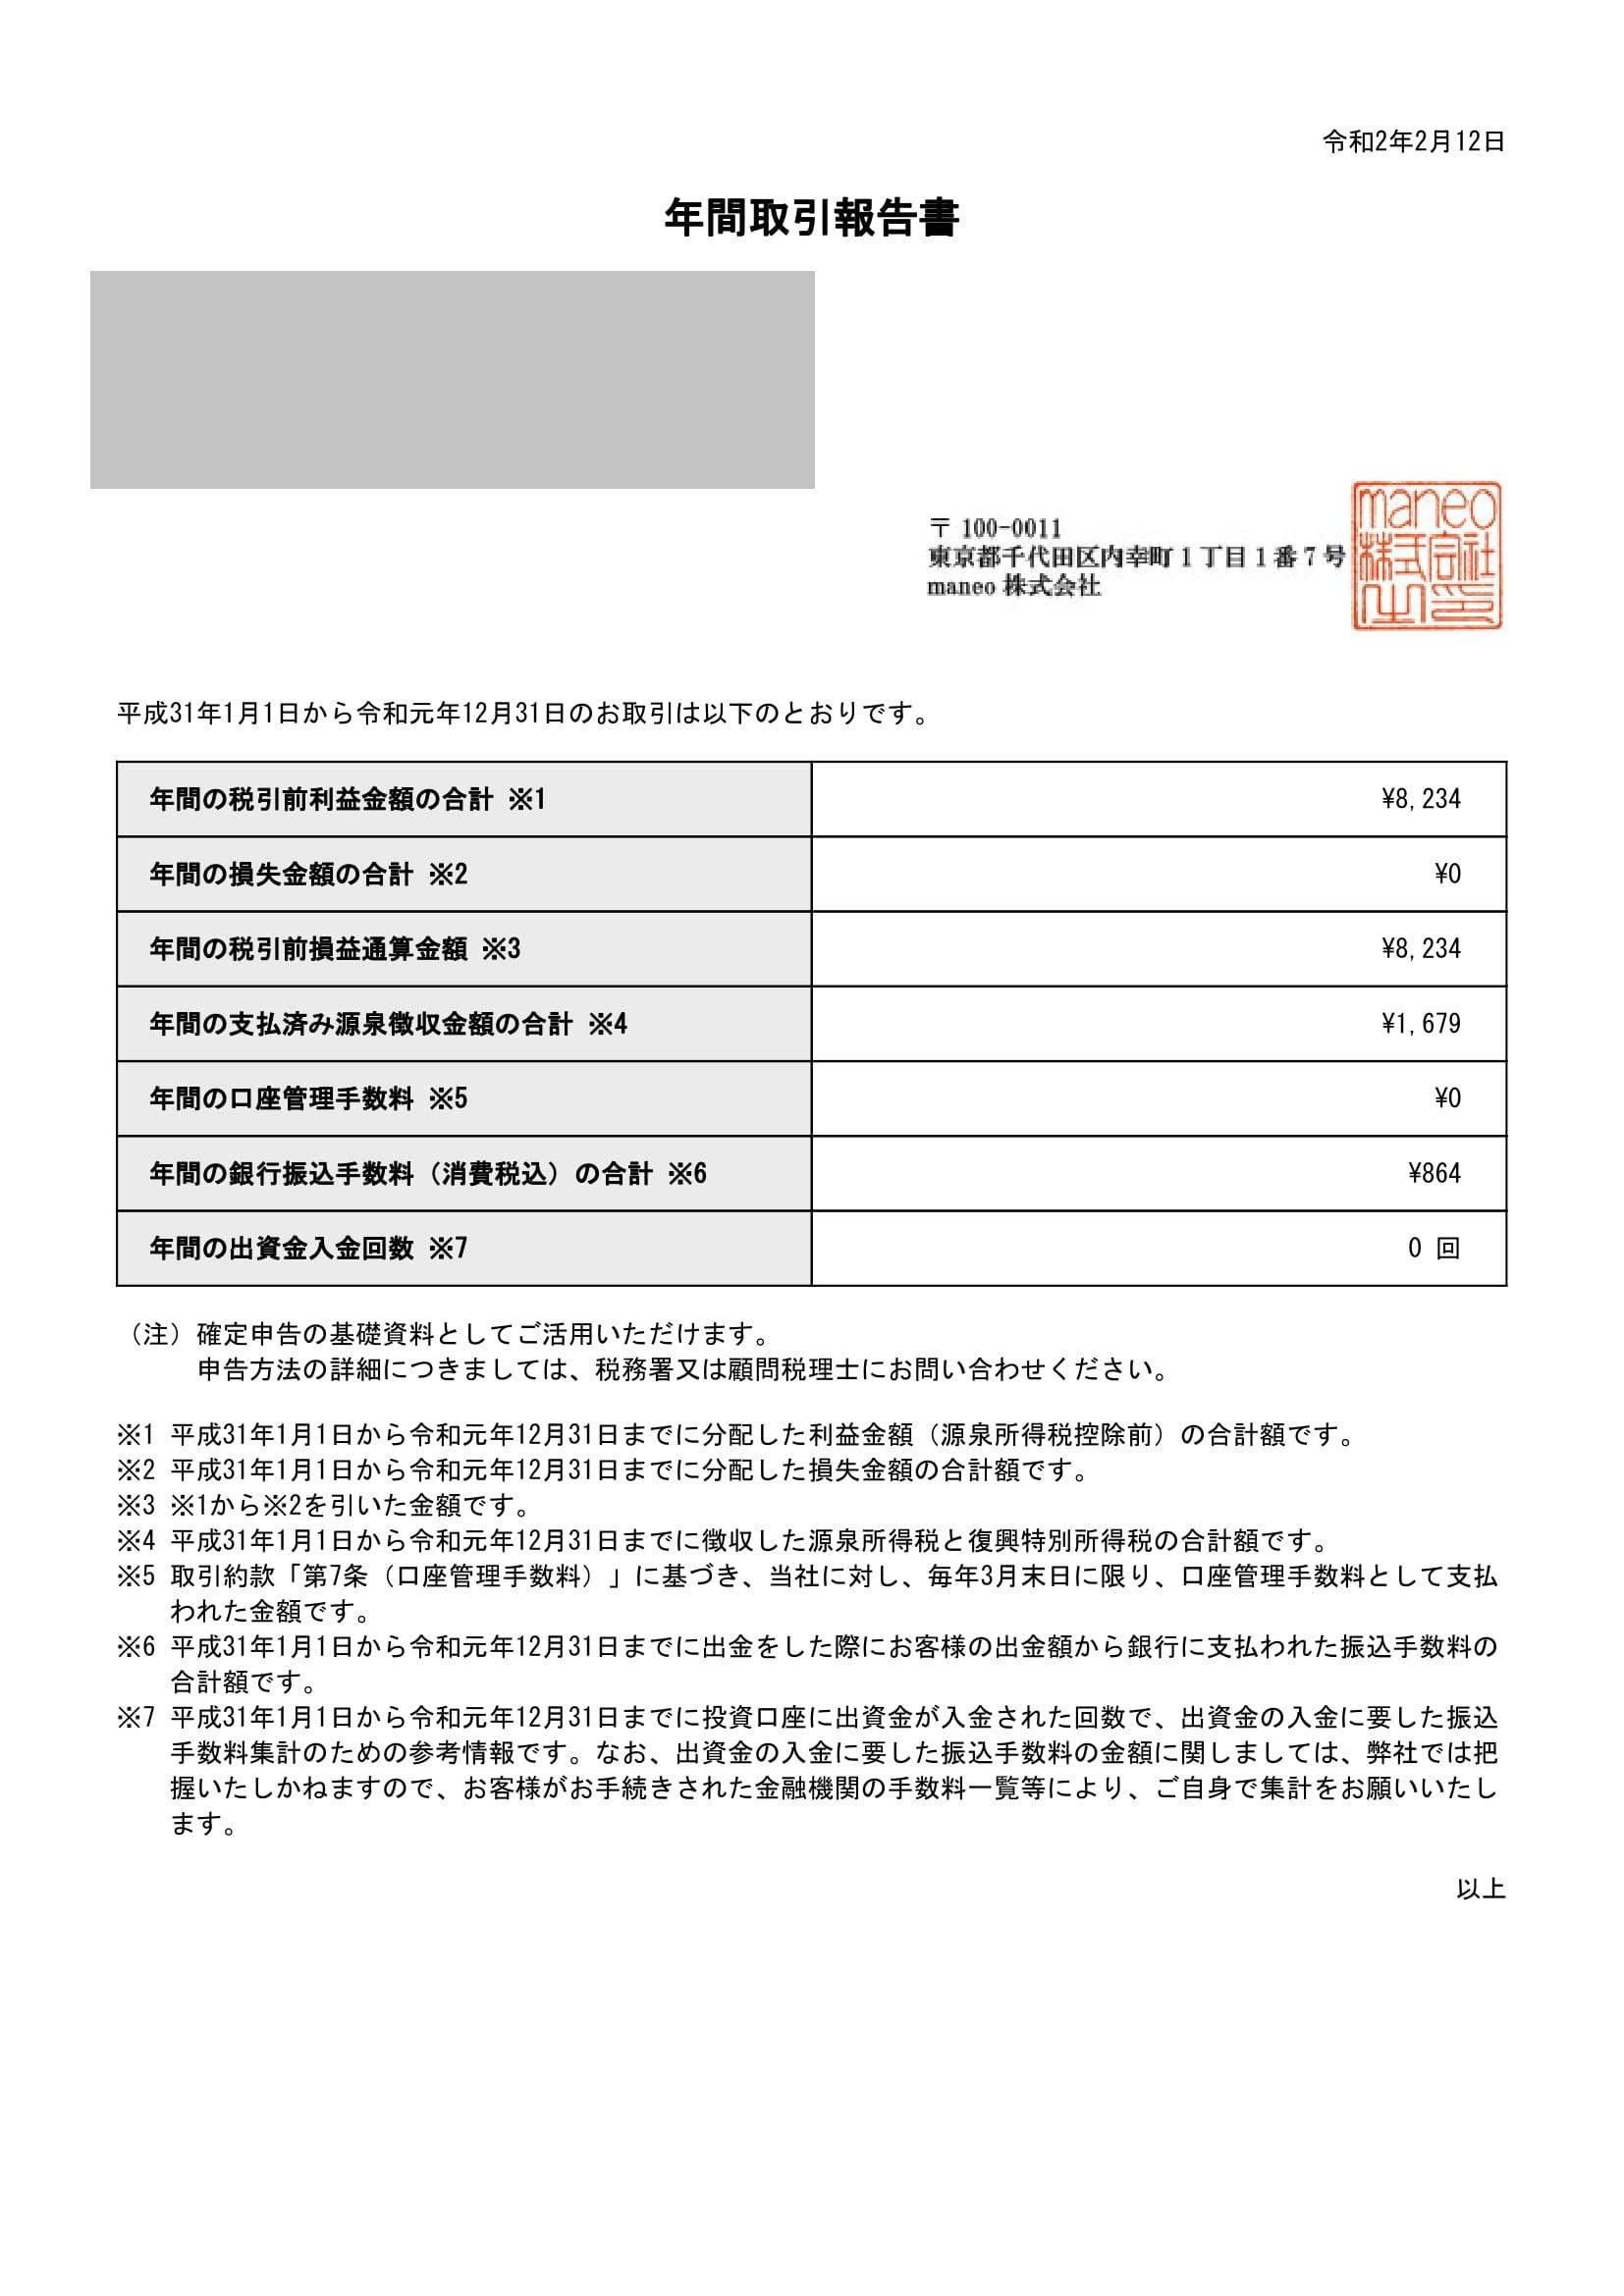 MANEO確定申告データ_23336_20200212-1